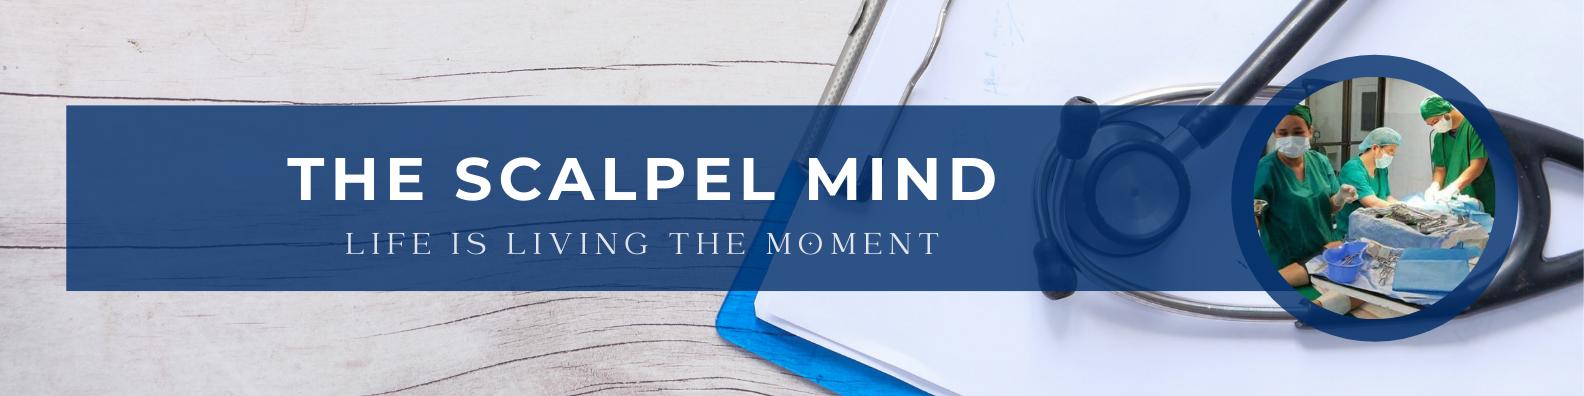 The Scalpel Mind